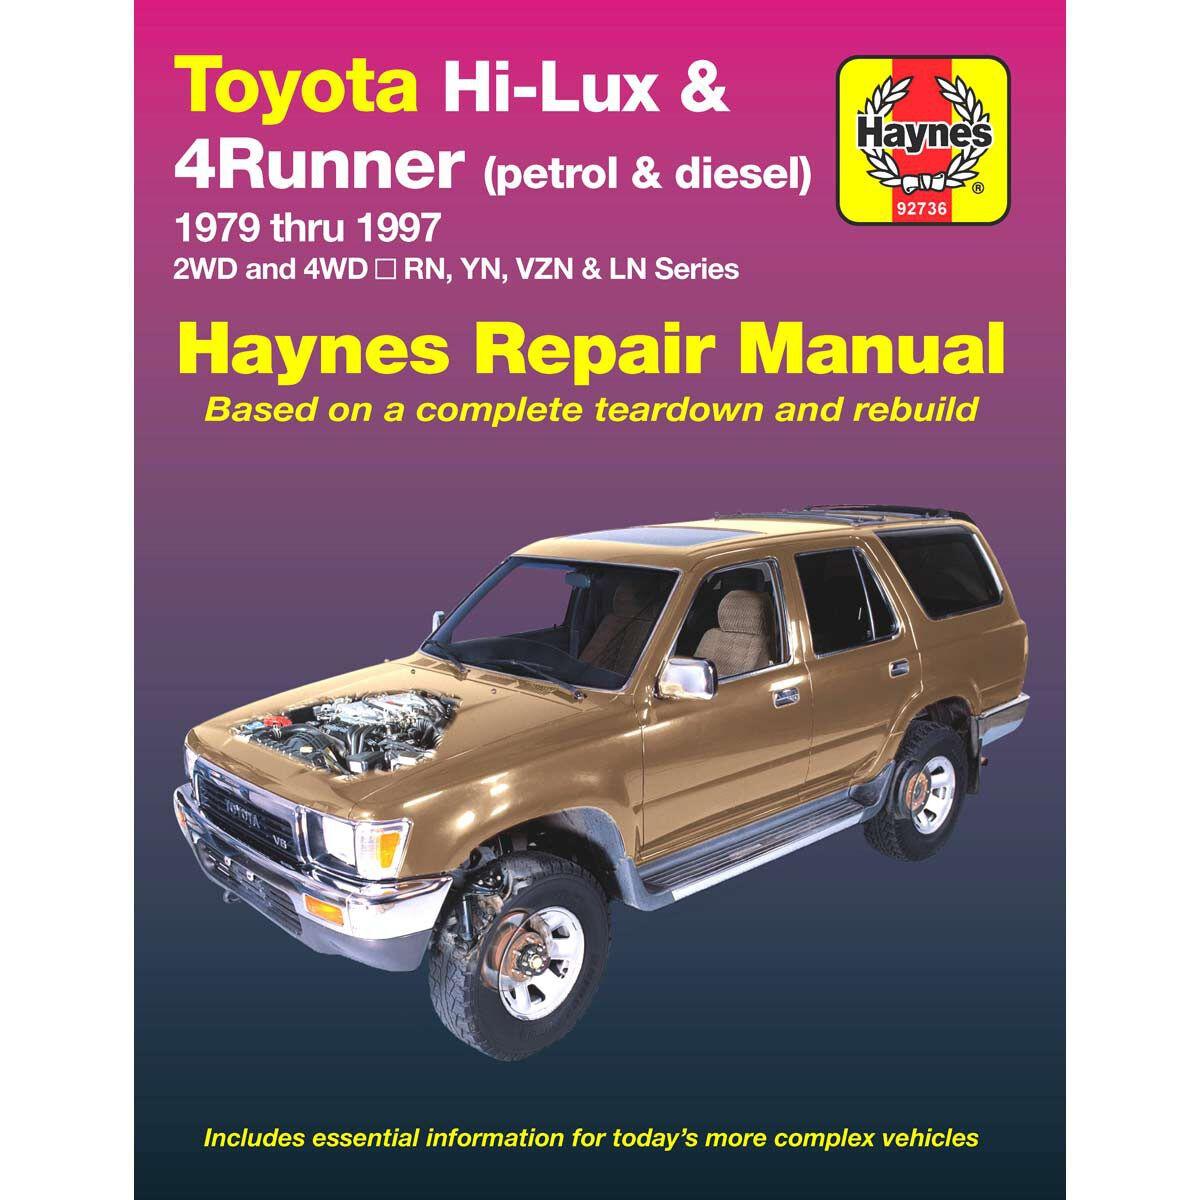 car manuals supercheap auto new zealand rh supercheapauto co nz Haynes Manuals for 2003 Jeep Clymer Manuals